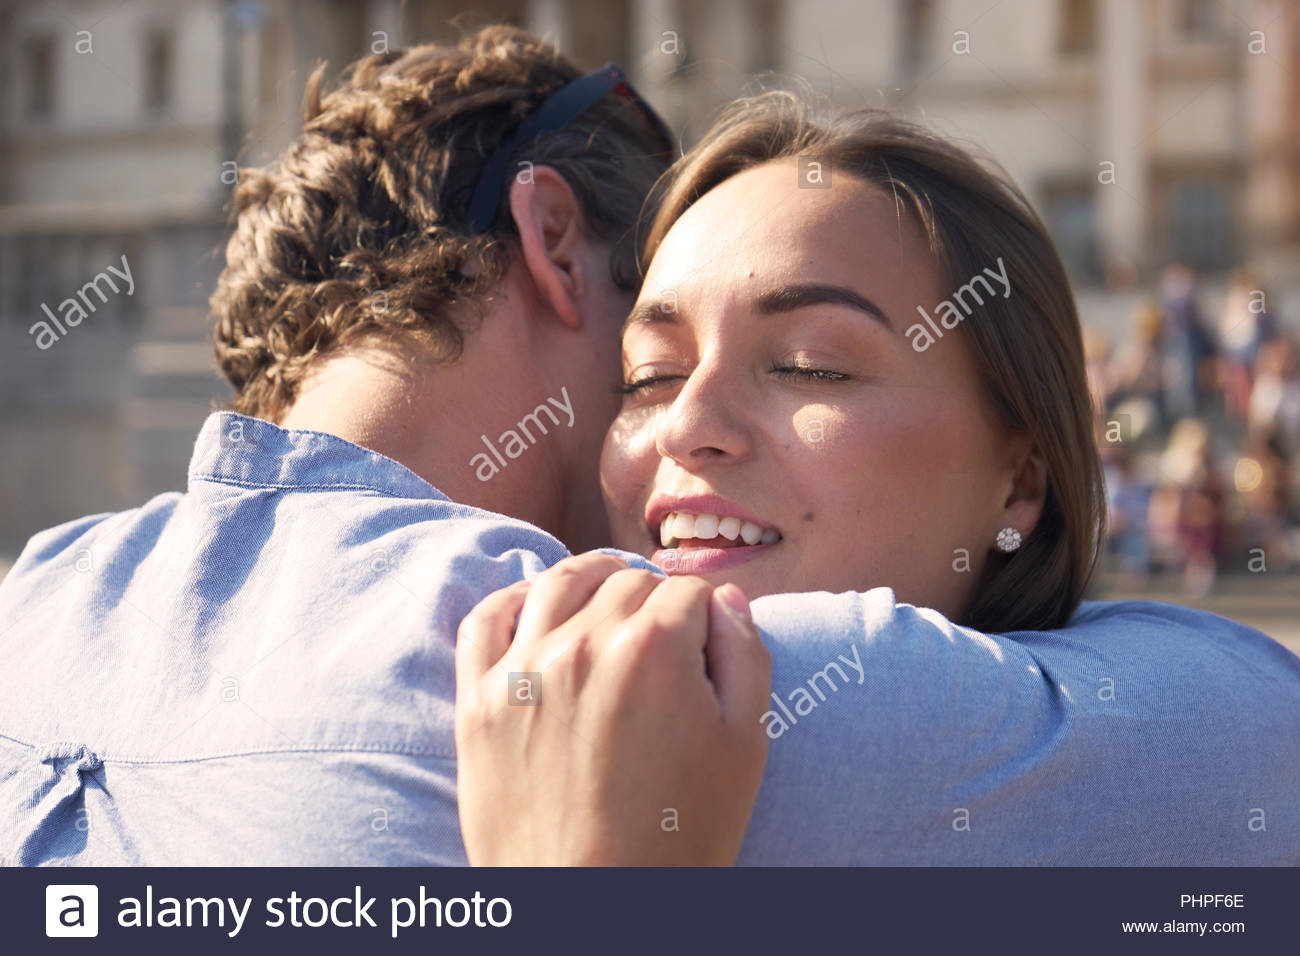 Couple embracing Photo Stock